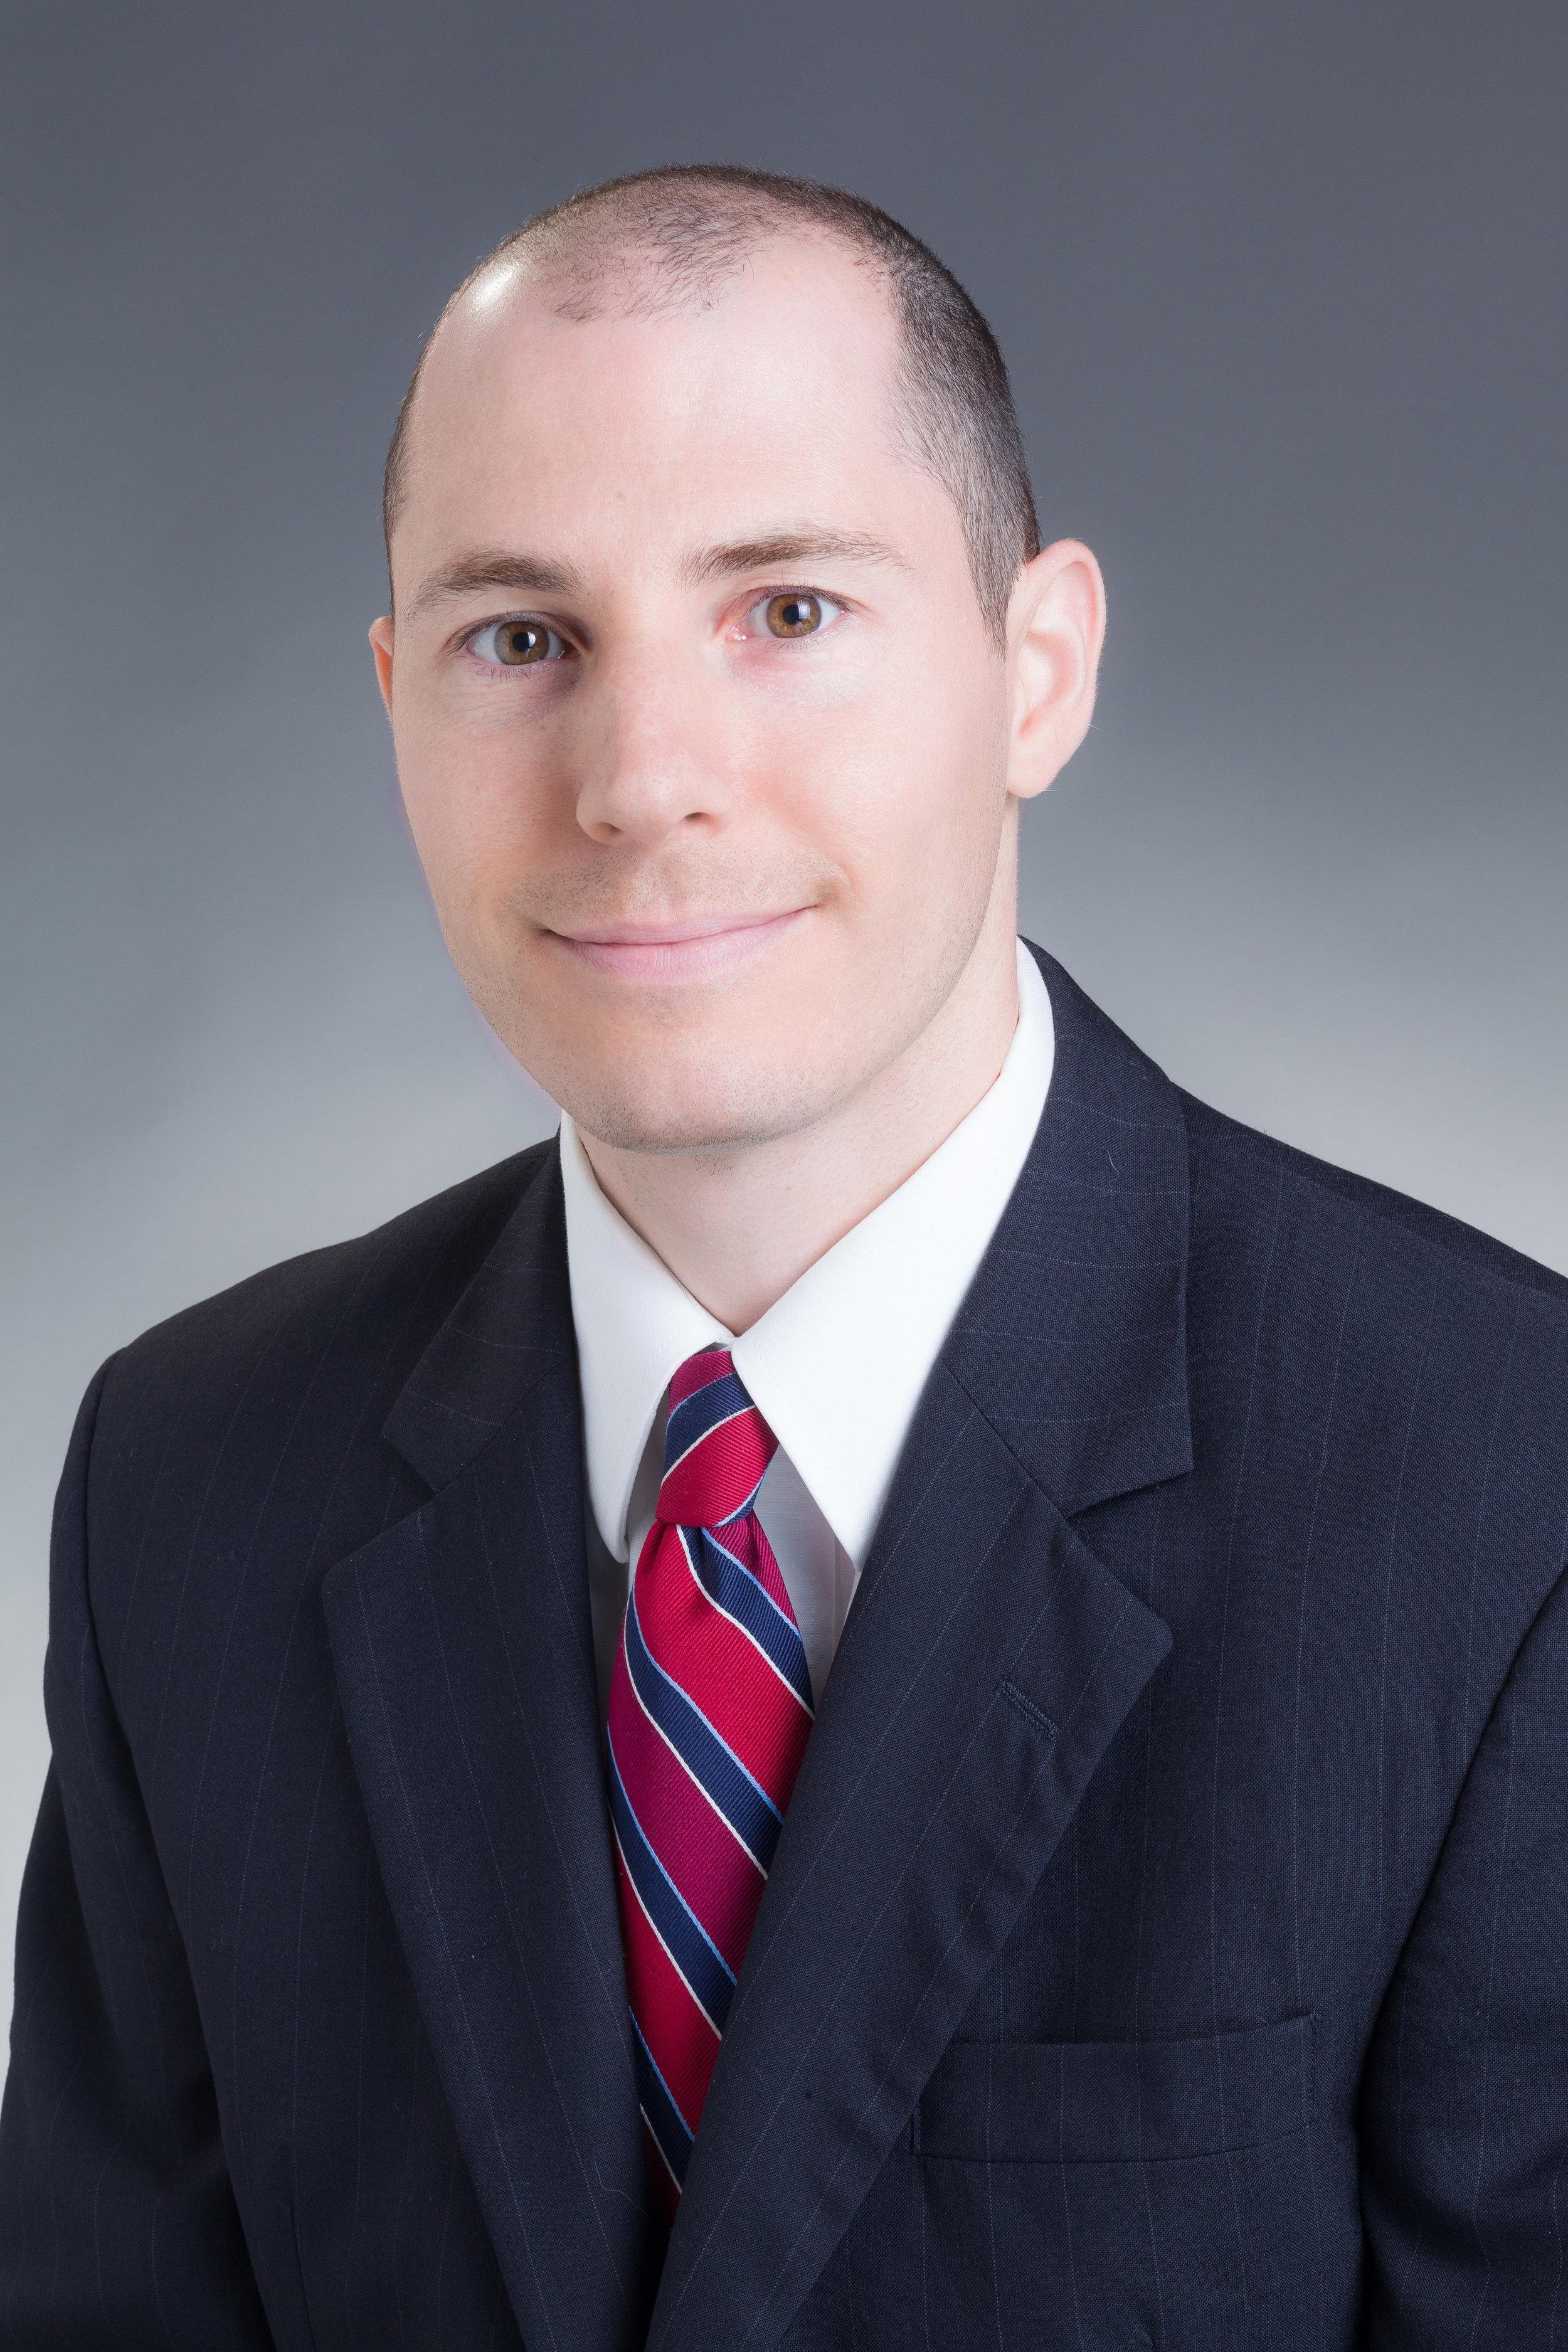 Joe Leonardi - VP, Credit Manager